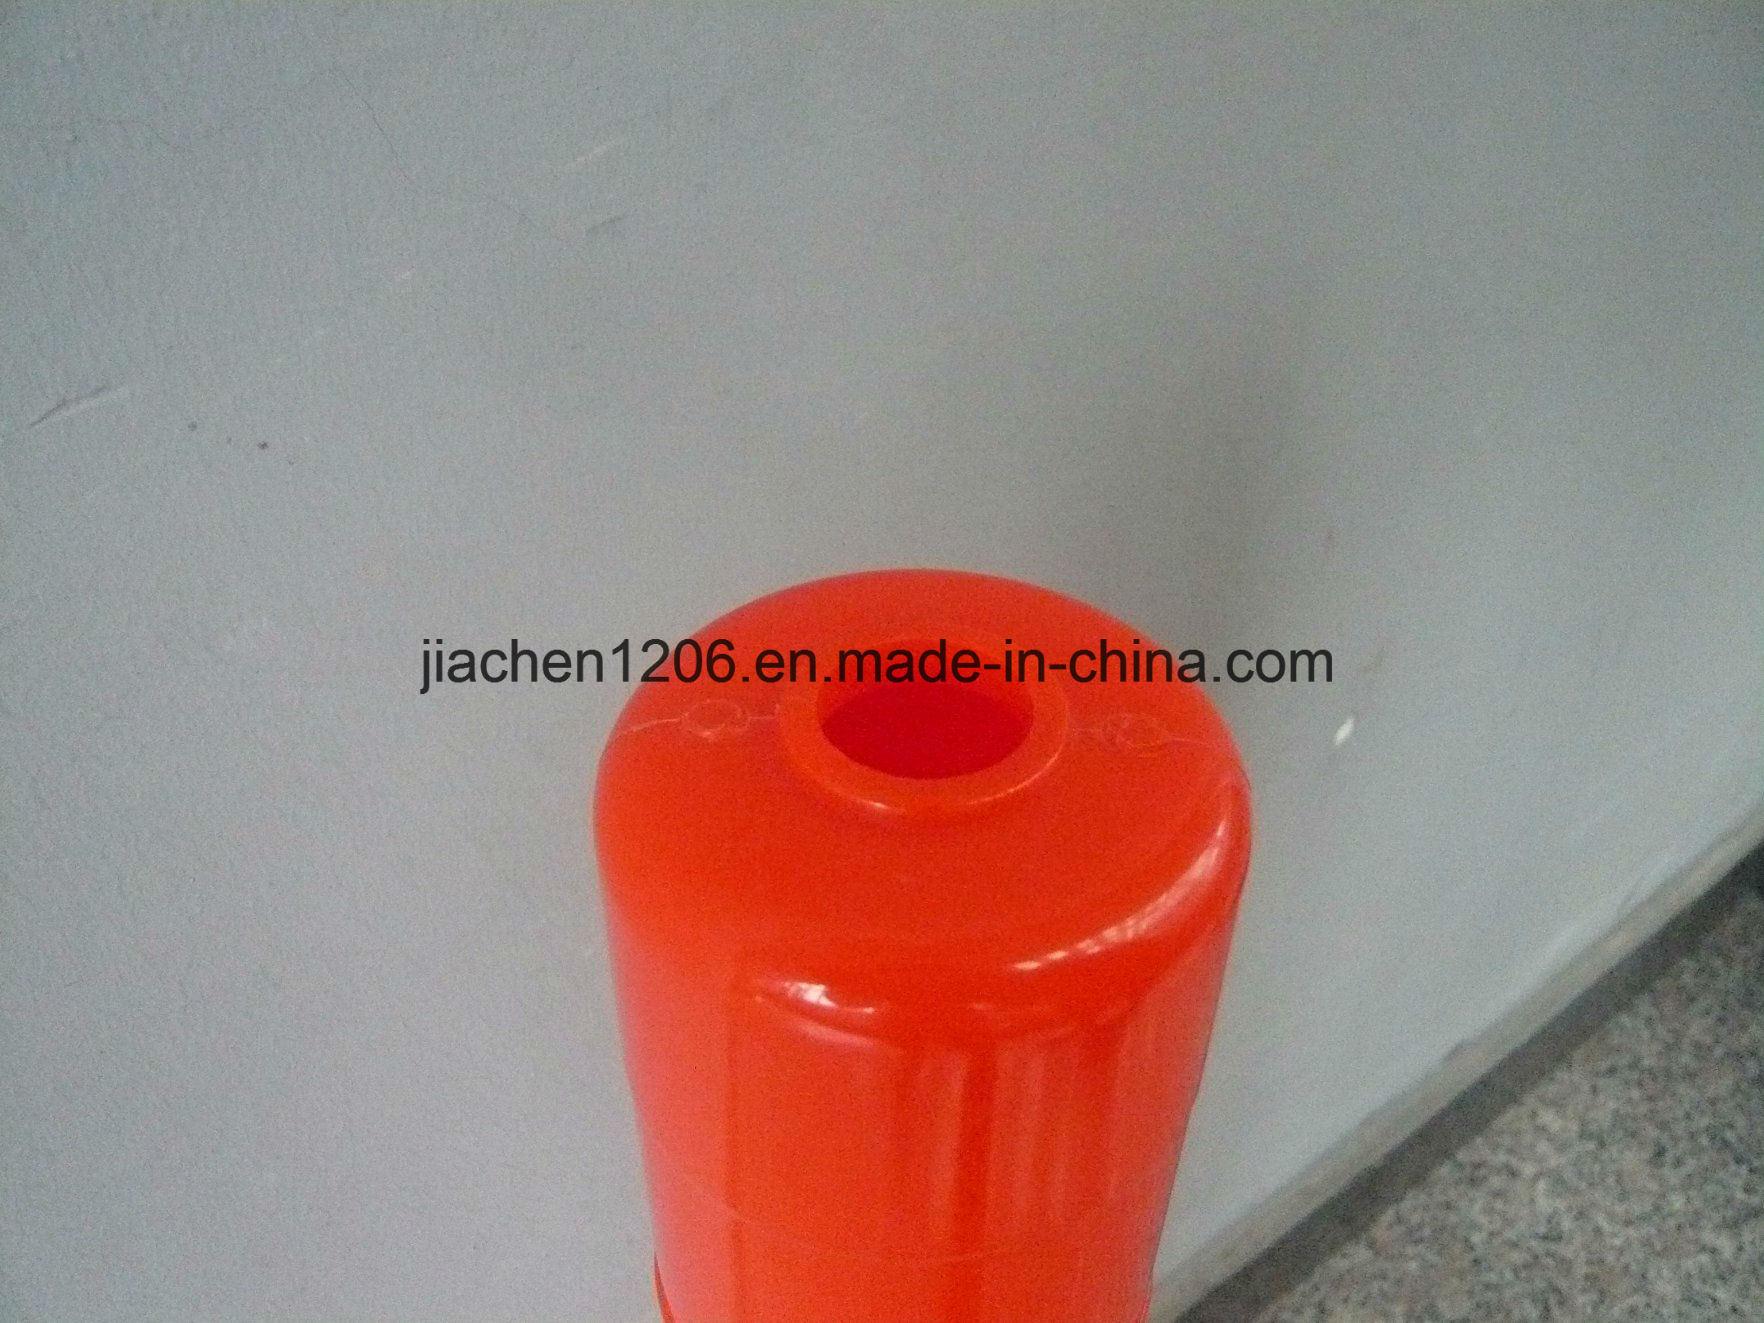 High-Luminance Reasonable Price 750mm PVC Warning Post